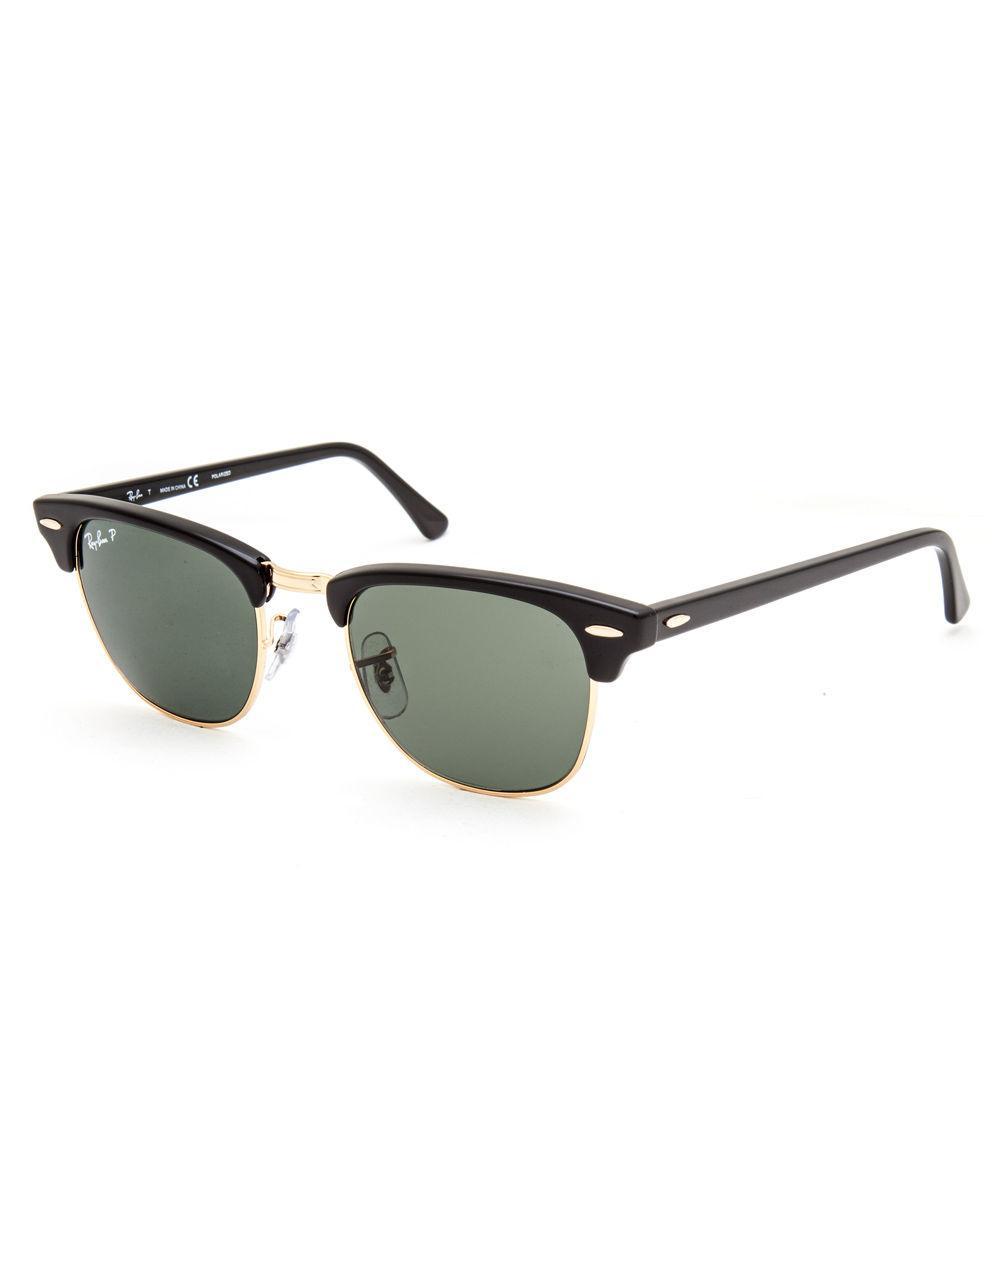 49fa027ec5 Lyst - Ray-Ban Clubmaster Classic Polarized Sunglasses in Black for Men